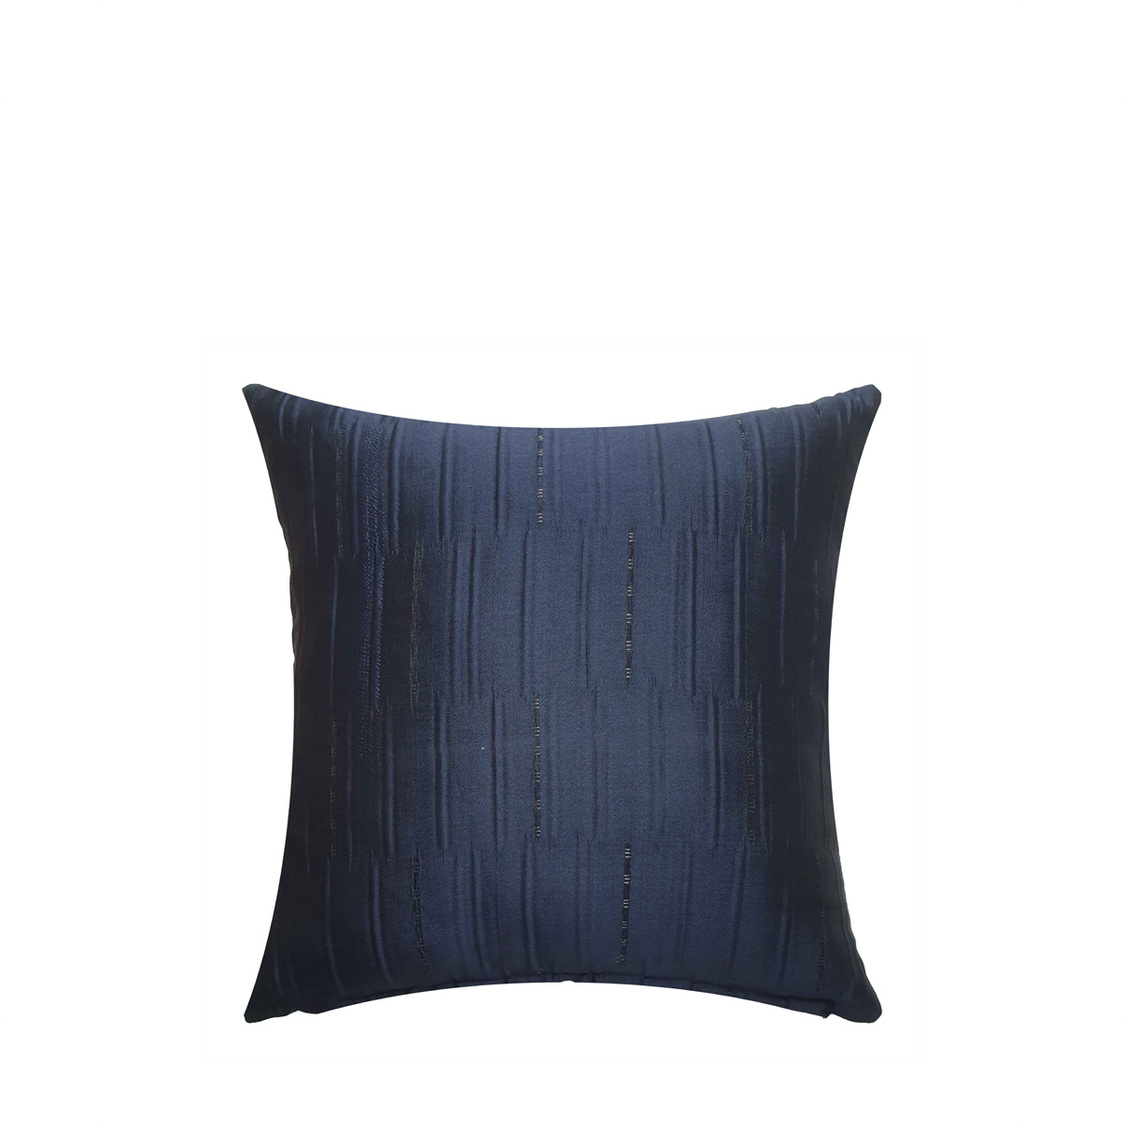 JRapee Pleats Cushion Cover Navy 43x43cm